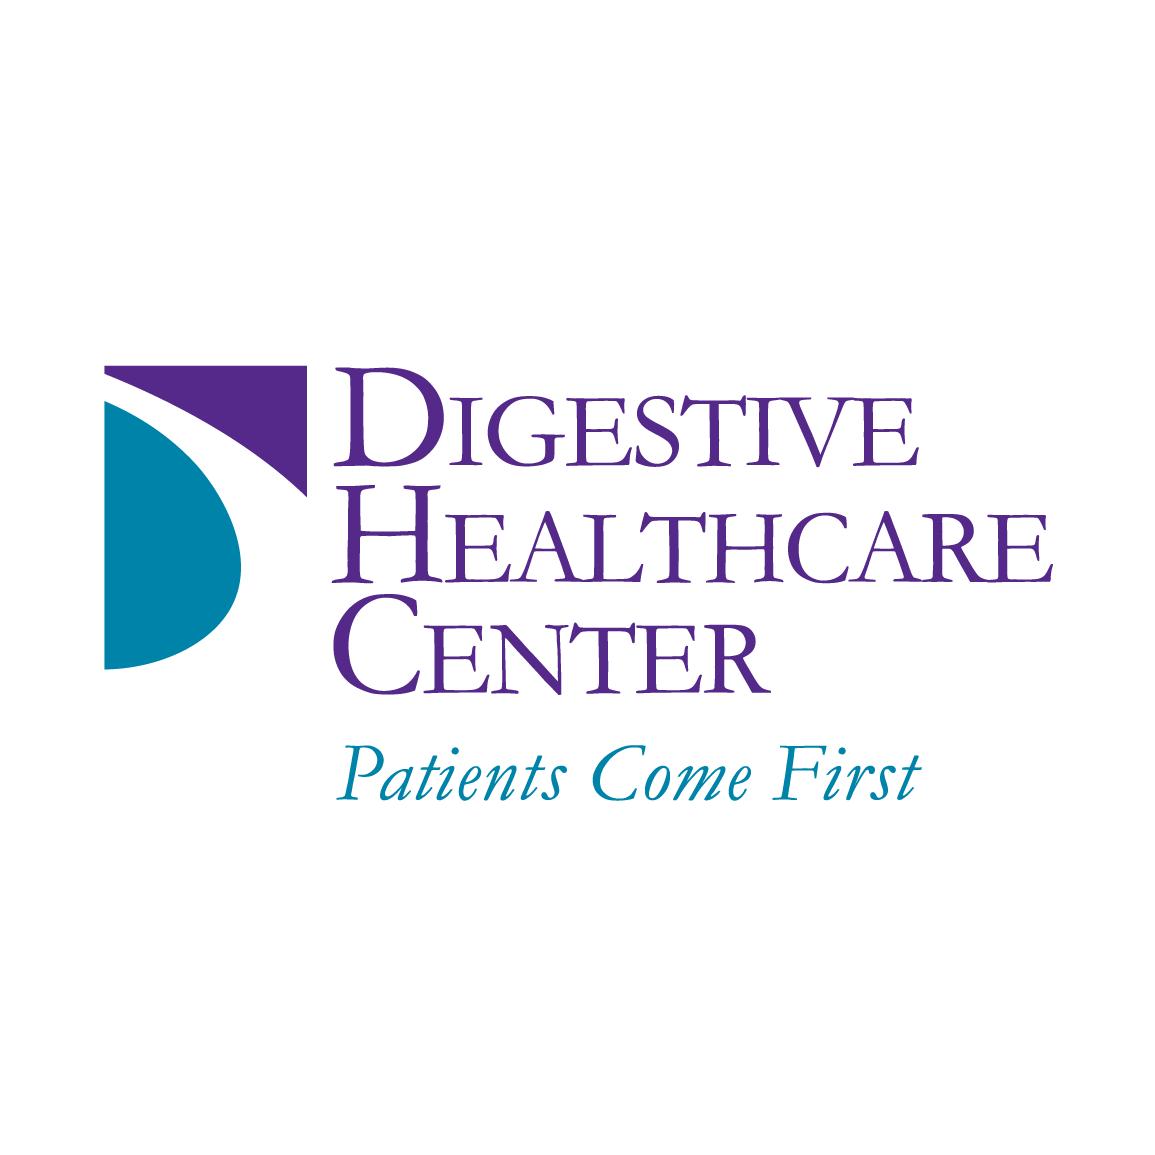 Digestive Healthcare Center